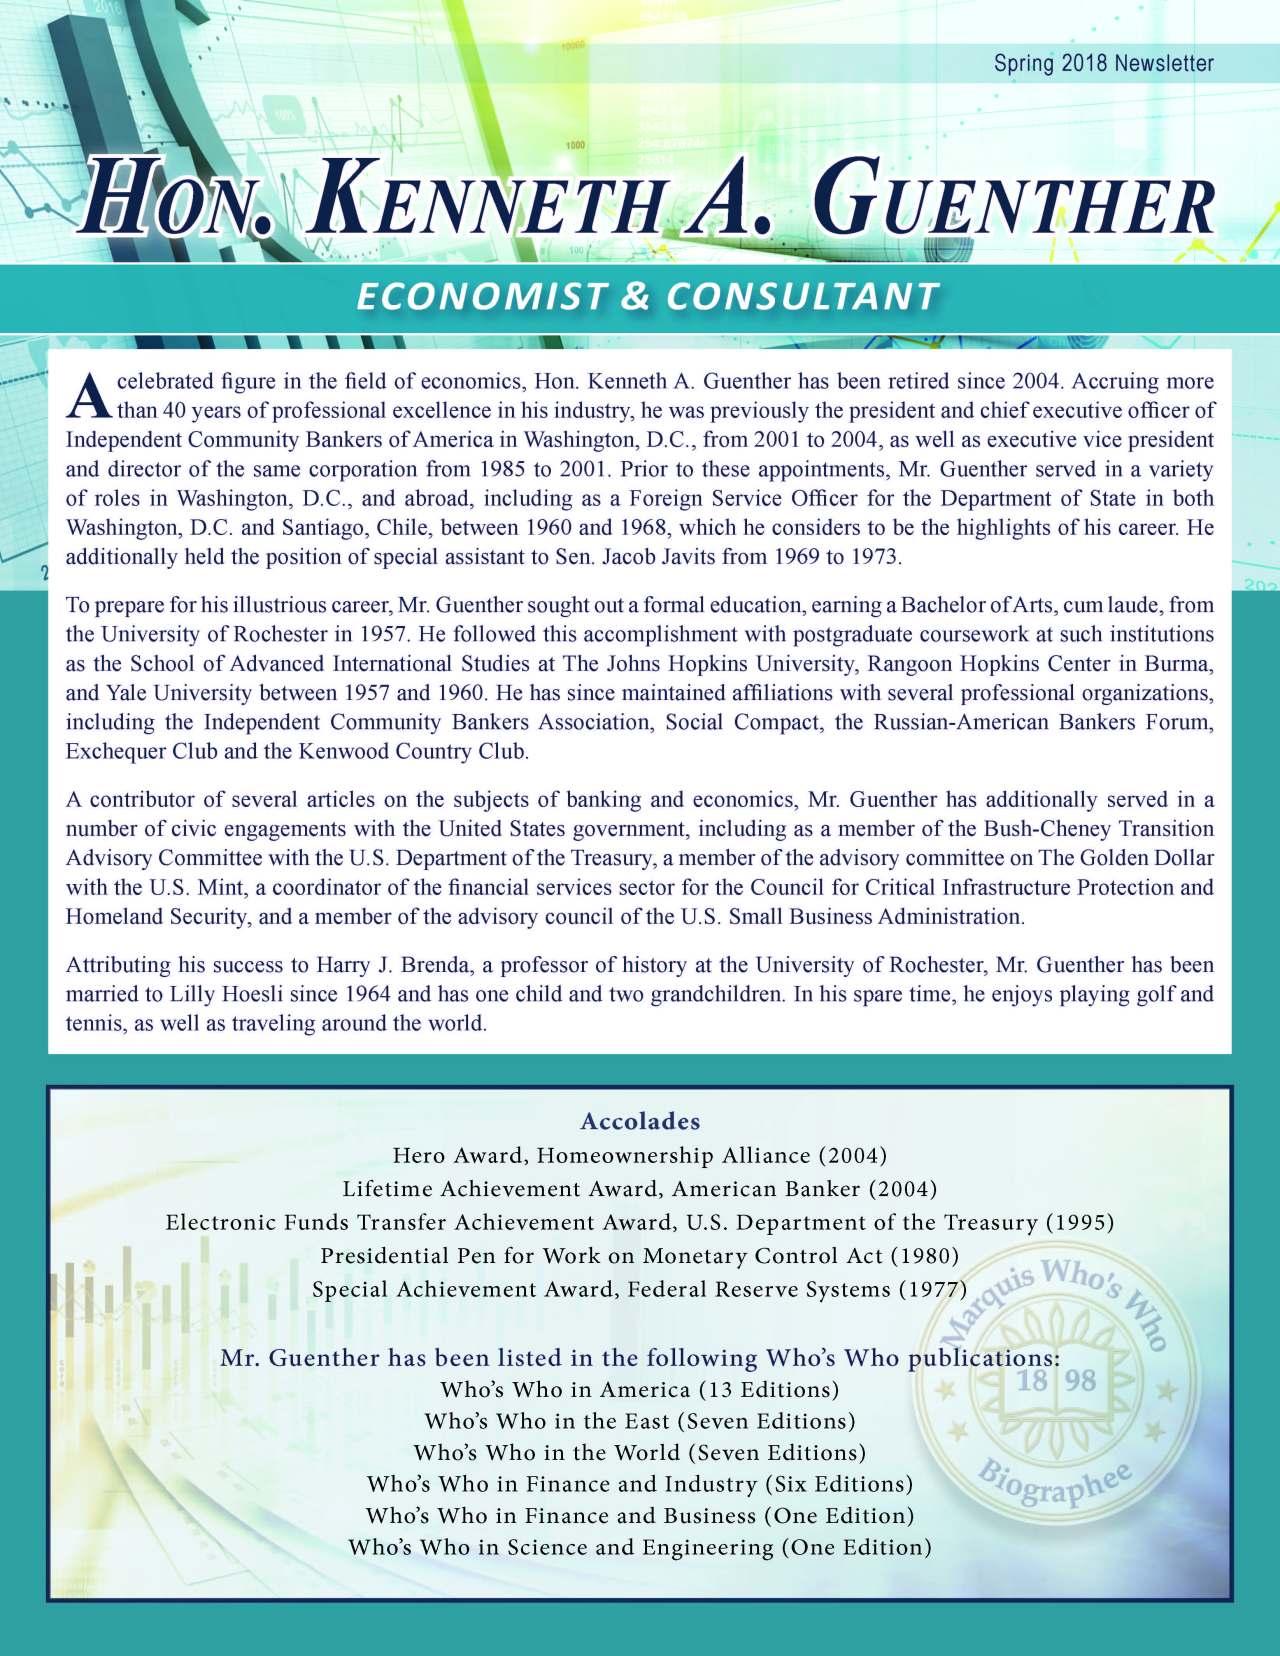 Guenther, Kenneth 3713109_2717210 Newsletter.jpg